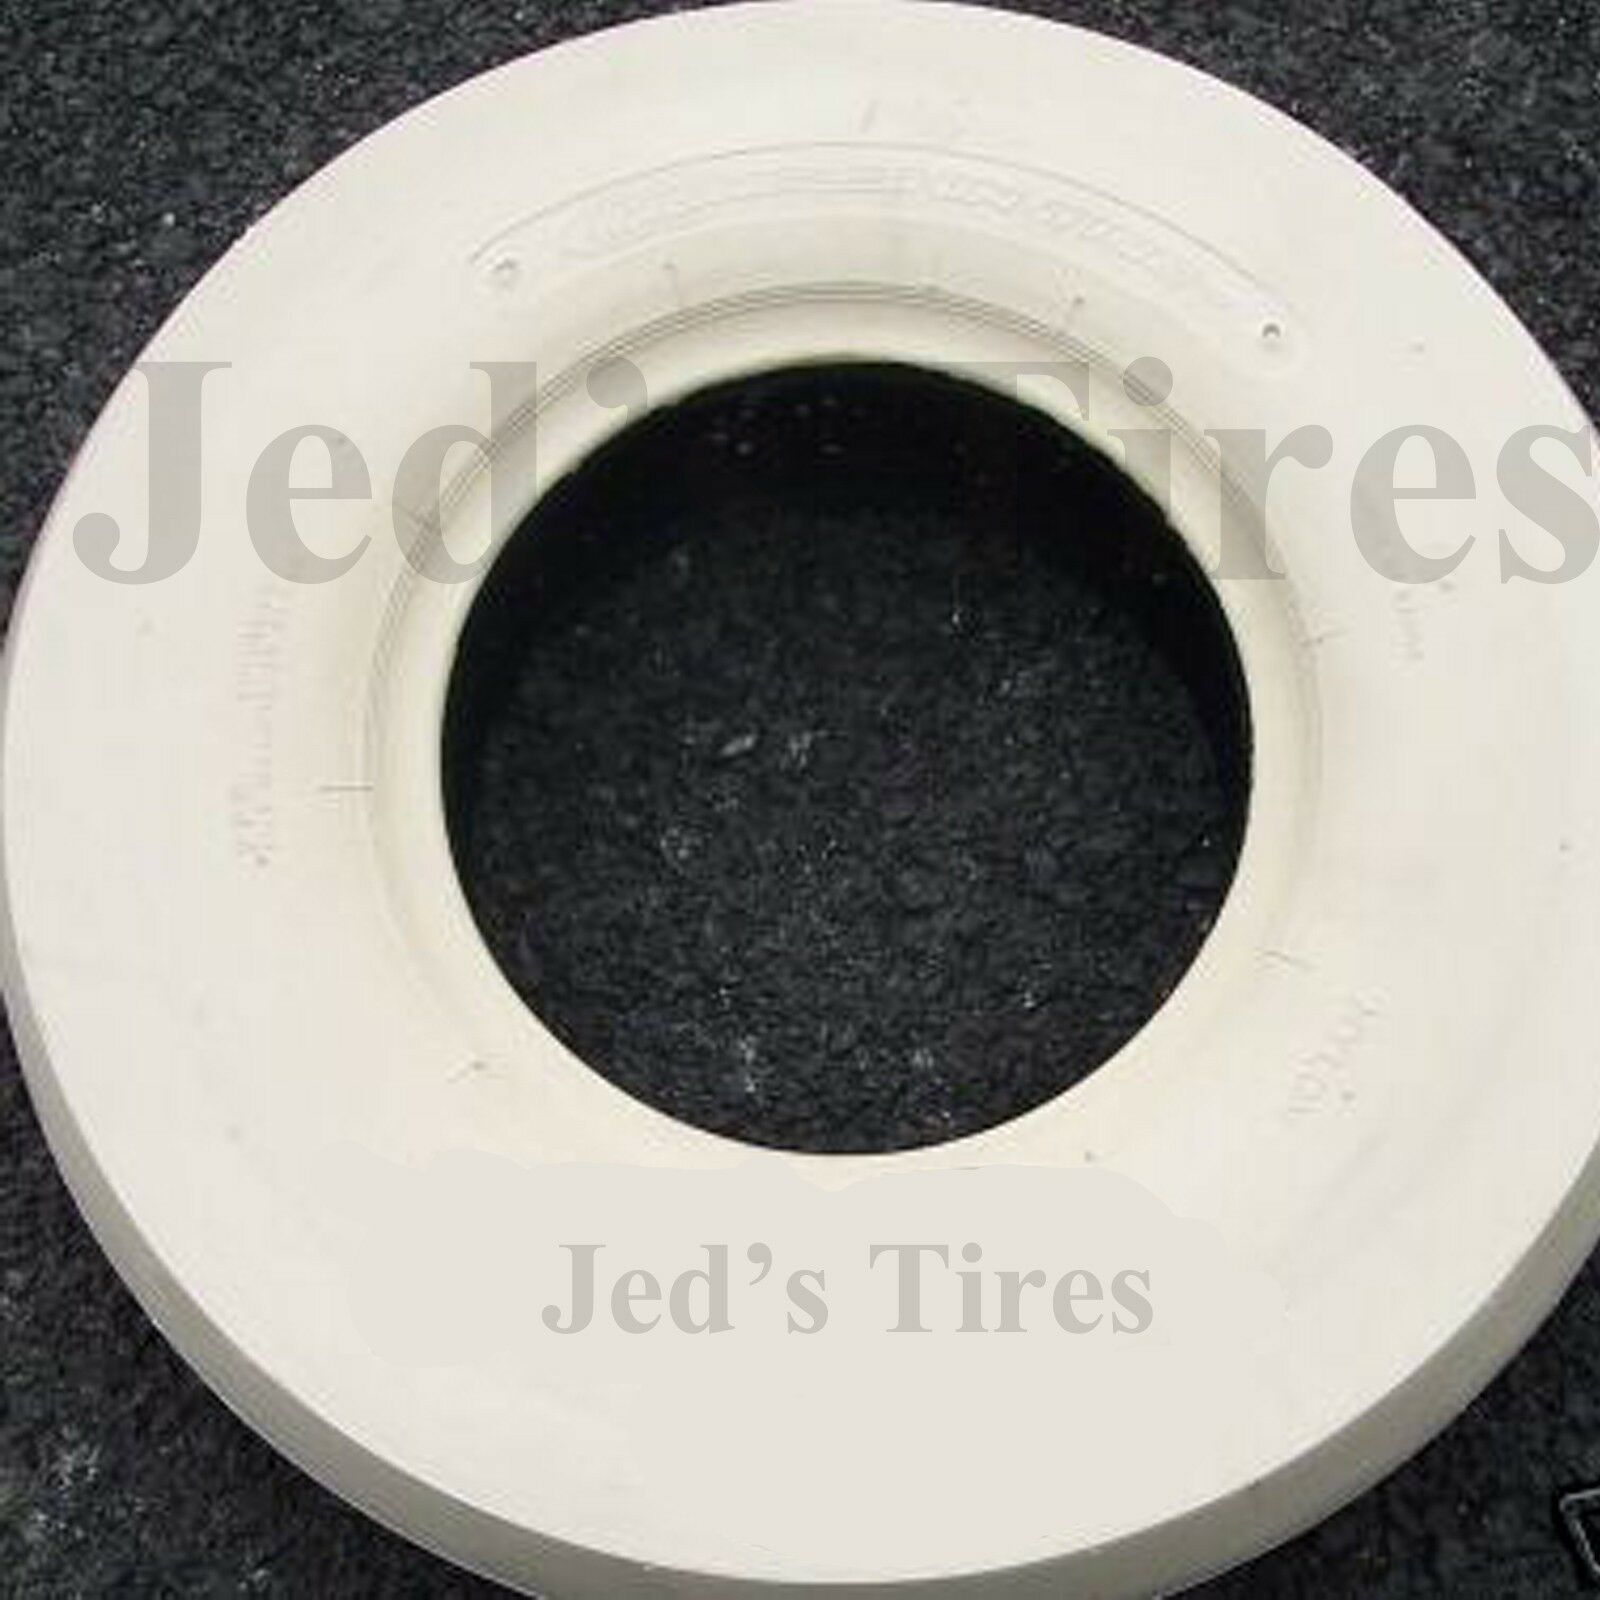 4.80-8 4.80x8 480-8 480x8 480/400-8 Base Ball Ball Base Pitching Machine Replacement Tire 51f571